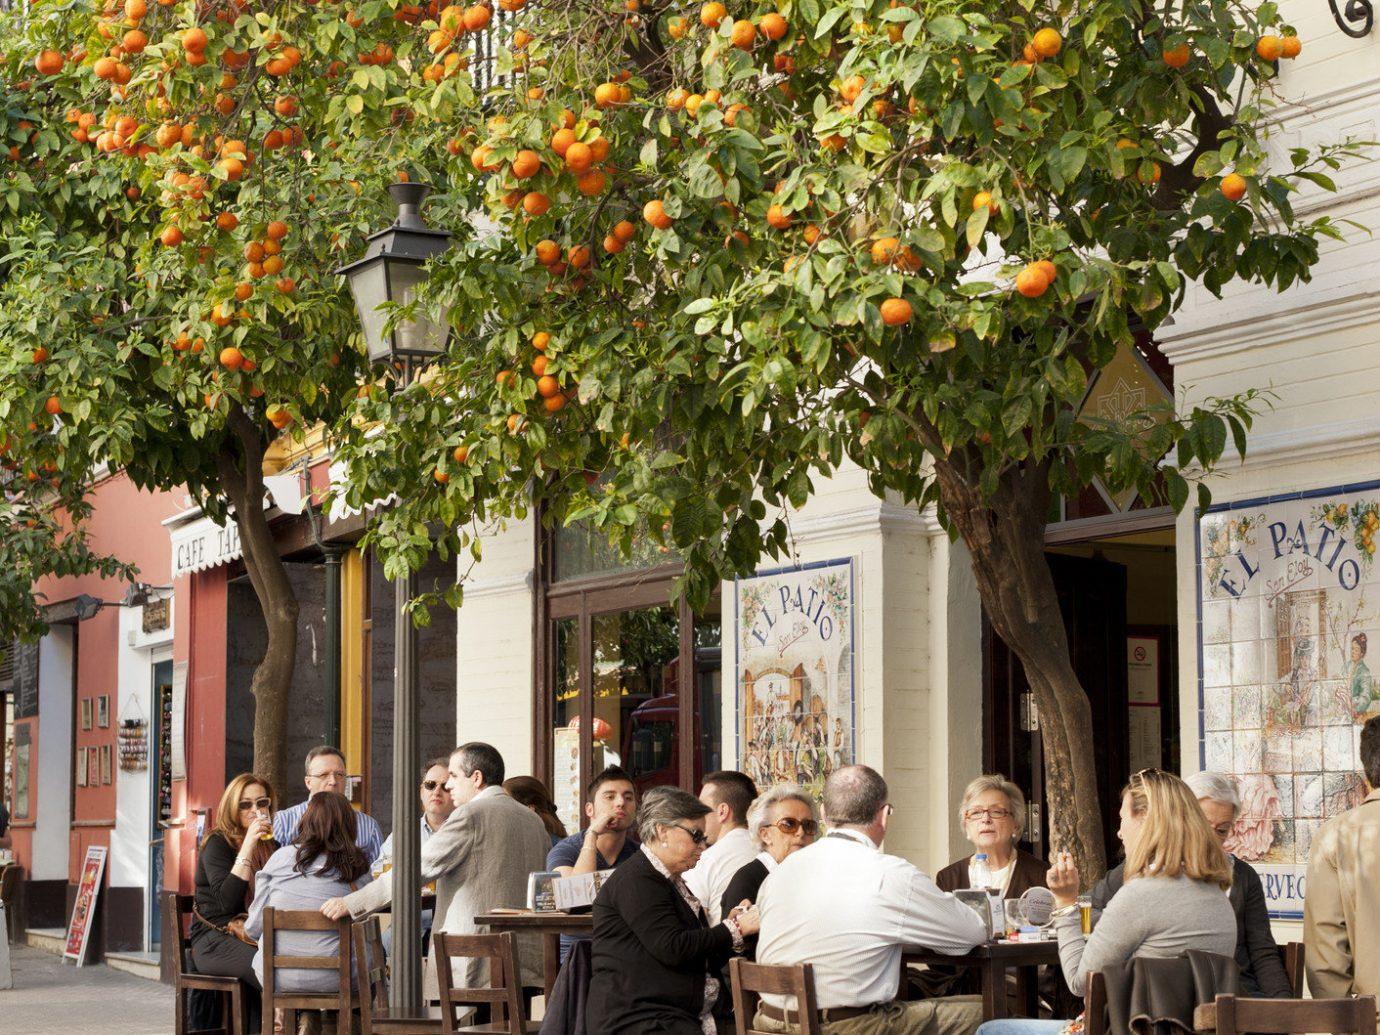 Trip Ideas outdoor tree neighbourhood flower restaurant Courtyard way sidewalk